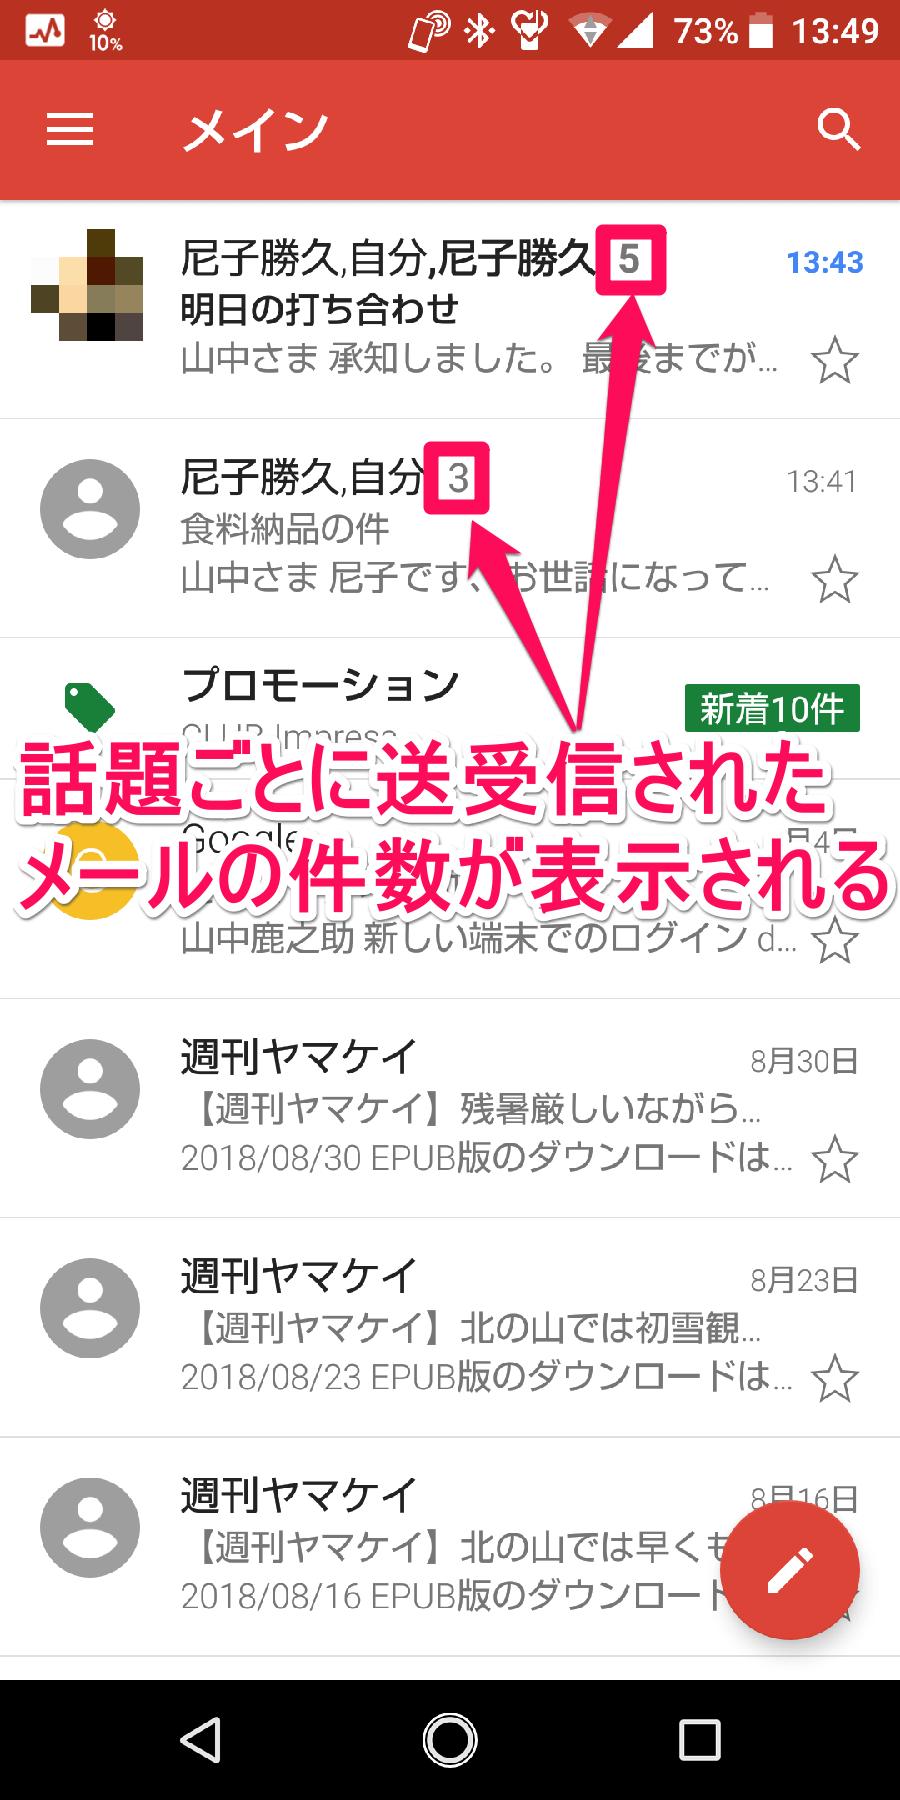 Gmail(ジーメール)アプリでスレッド表示がオンになっている画面